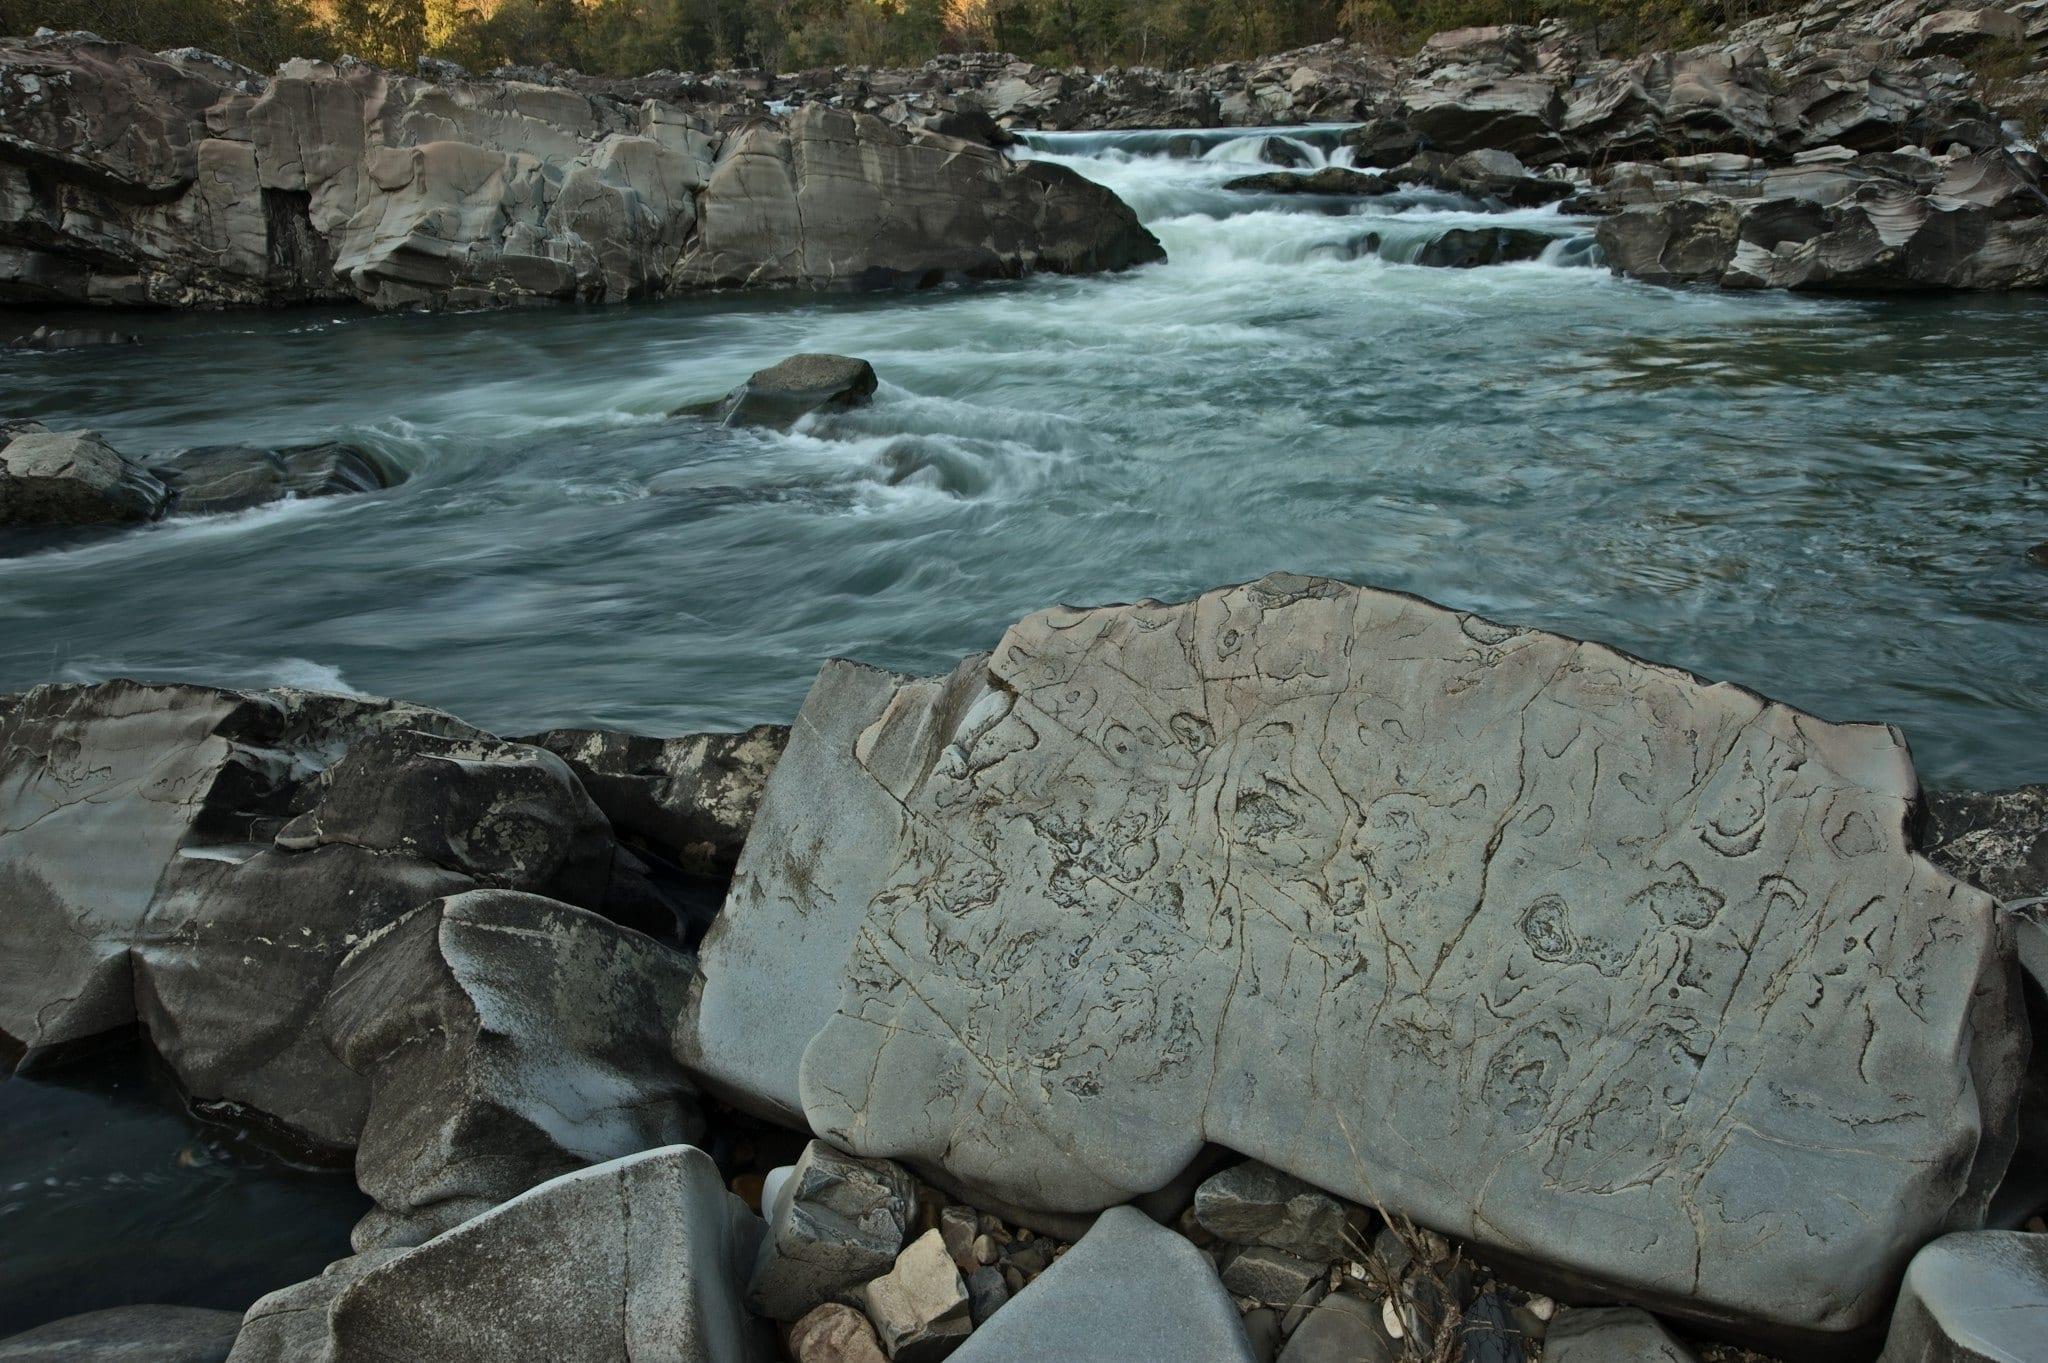 Cossatot Falls, Cossatot River State Park (Photo courtesy of Arkansas Department of Parks & Tourism)